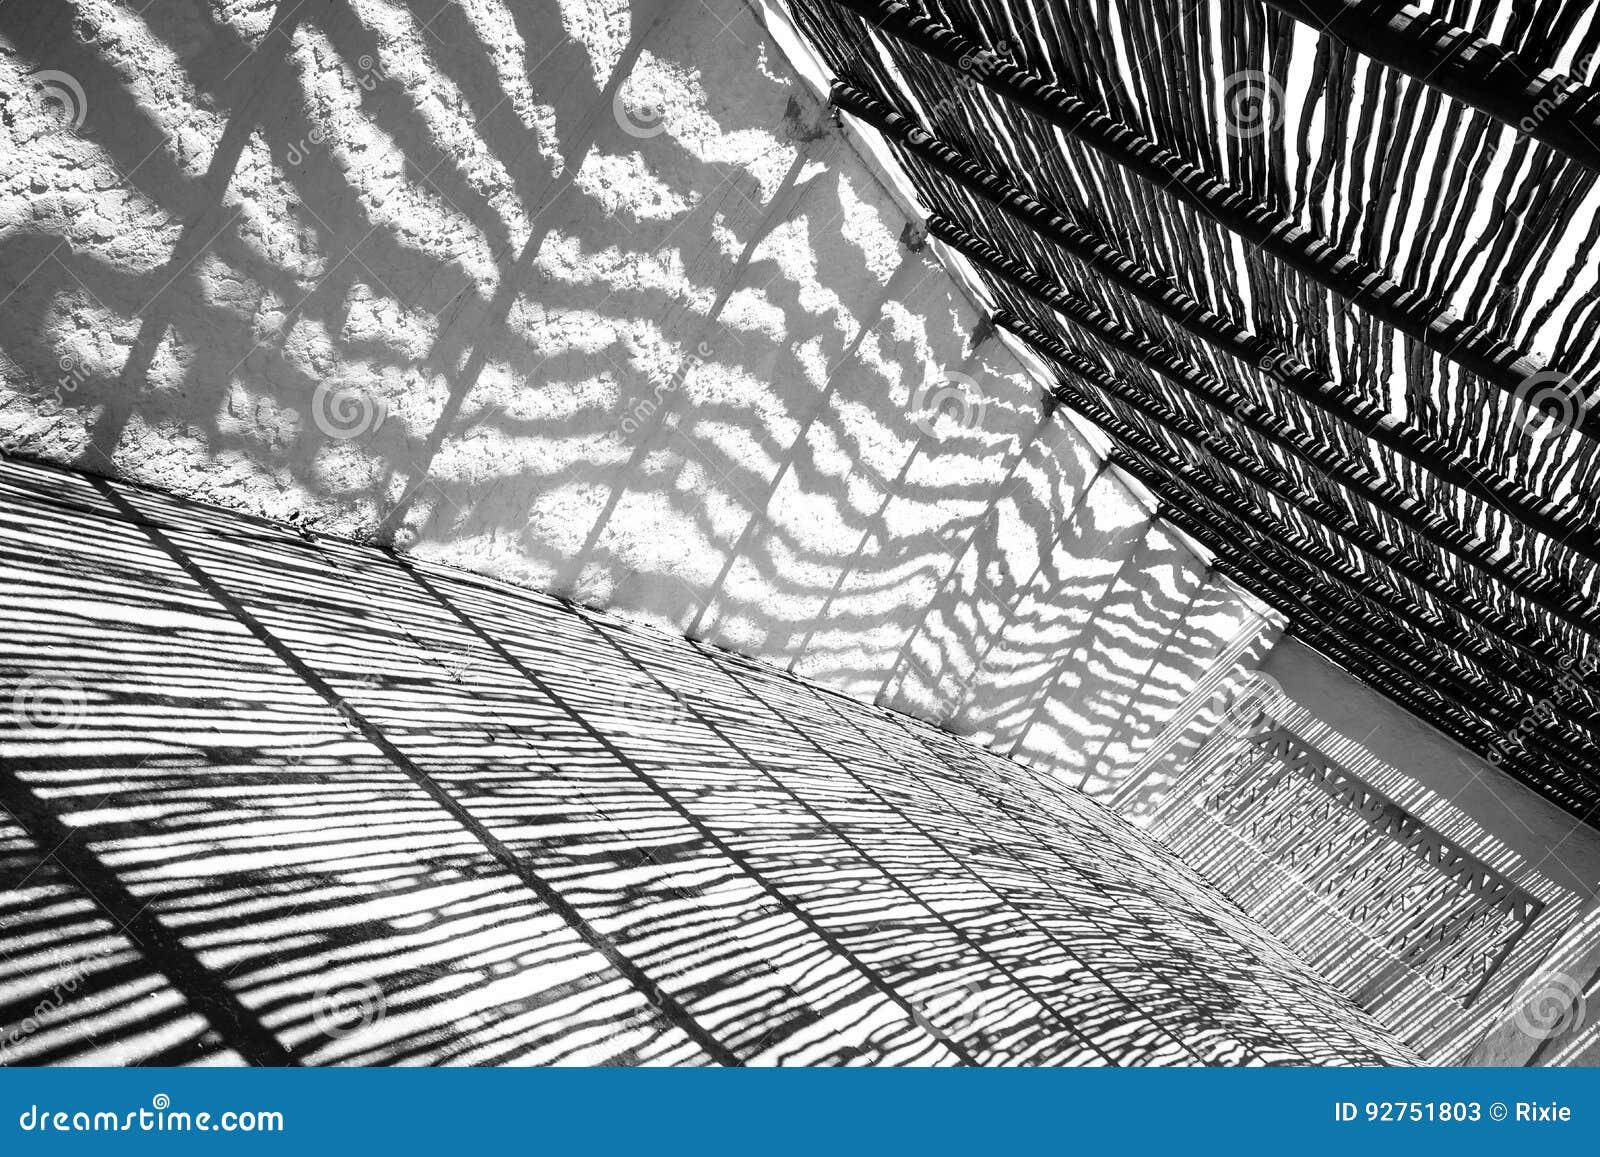 Shadows black and white